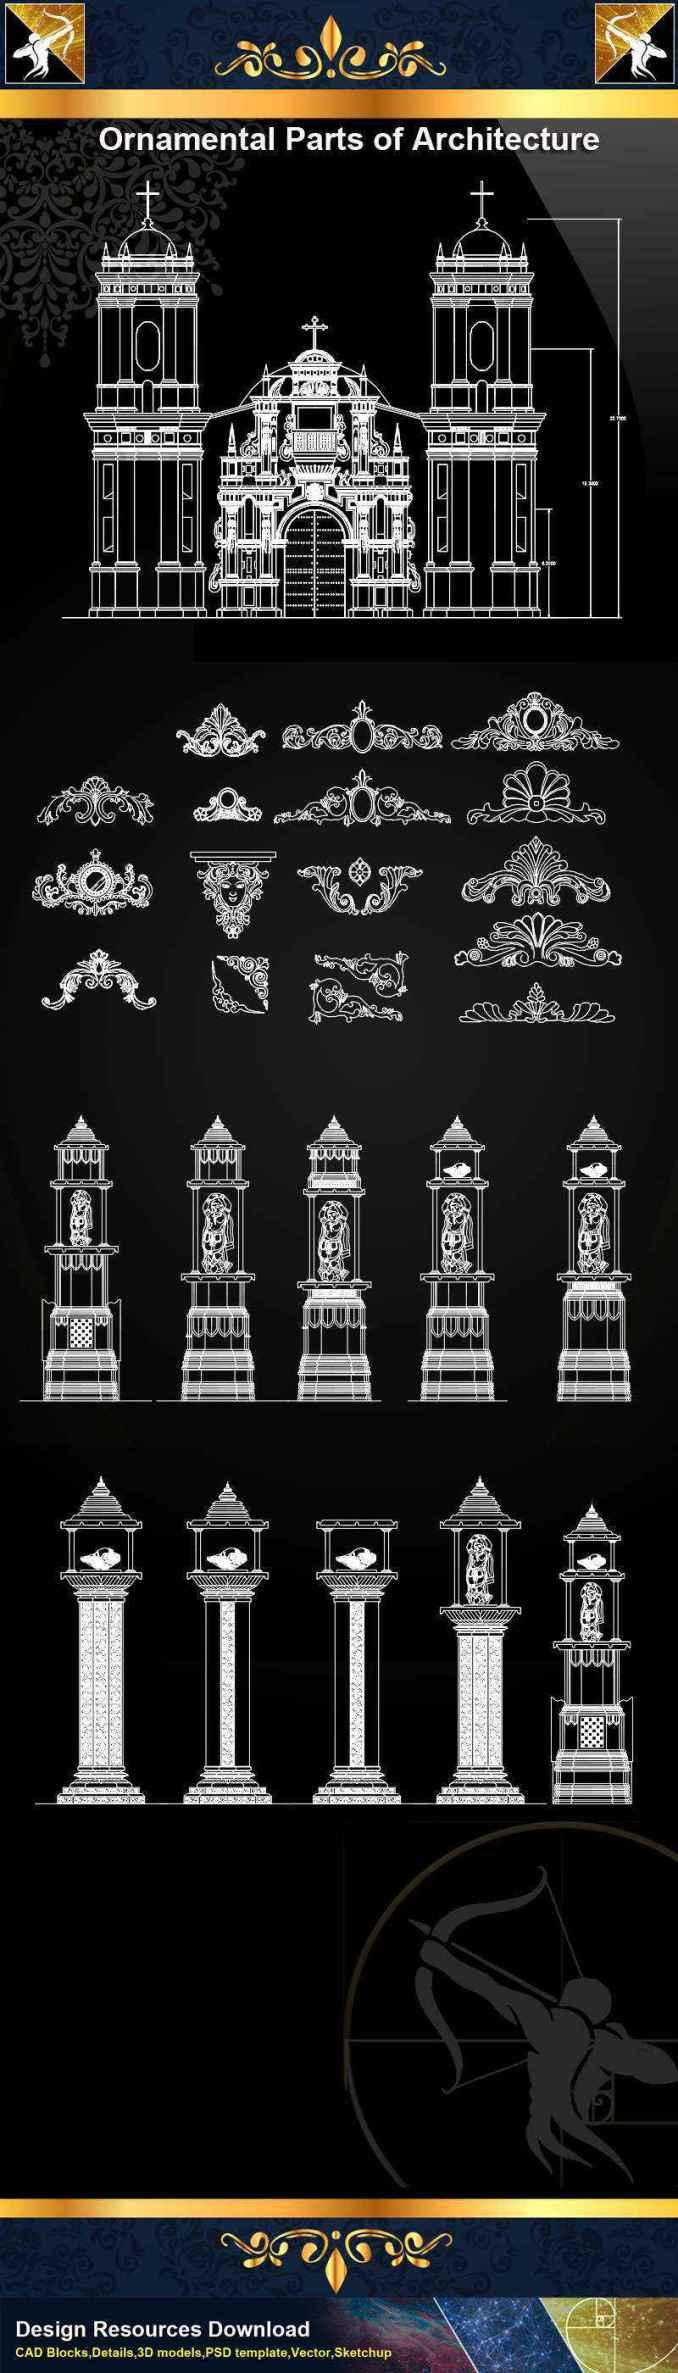 ★【Ornamental Parts of Architecture -Decoration Element CAD Blocks  V 6】@Autocad Decoration Blocks,Drawings,CAD Details,Elevation